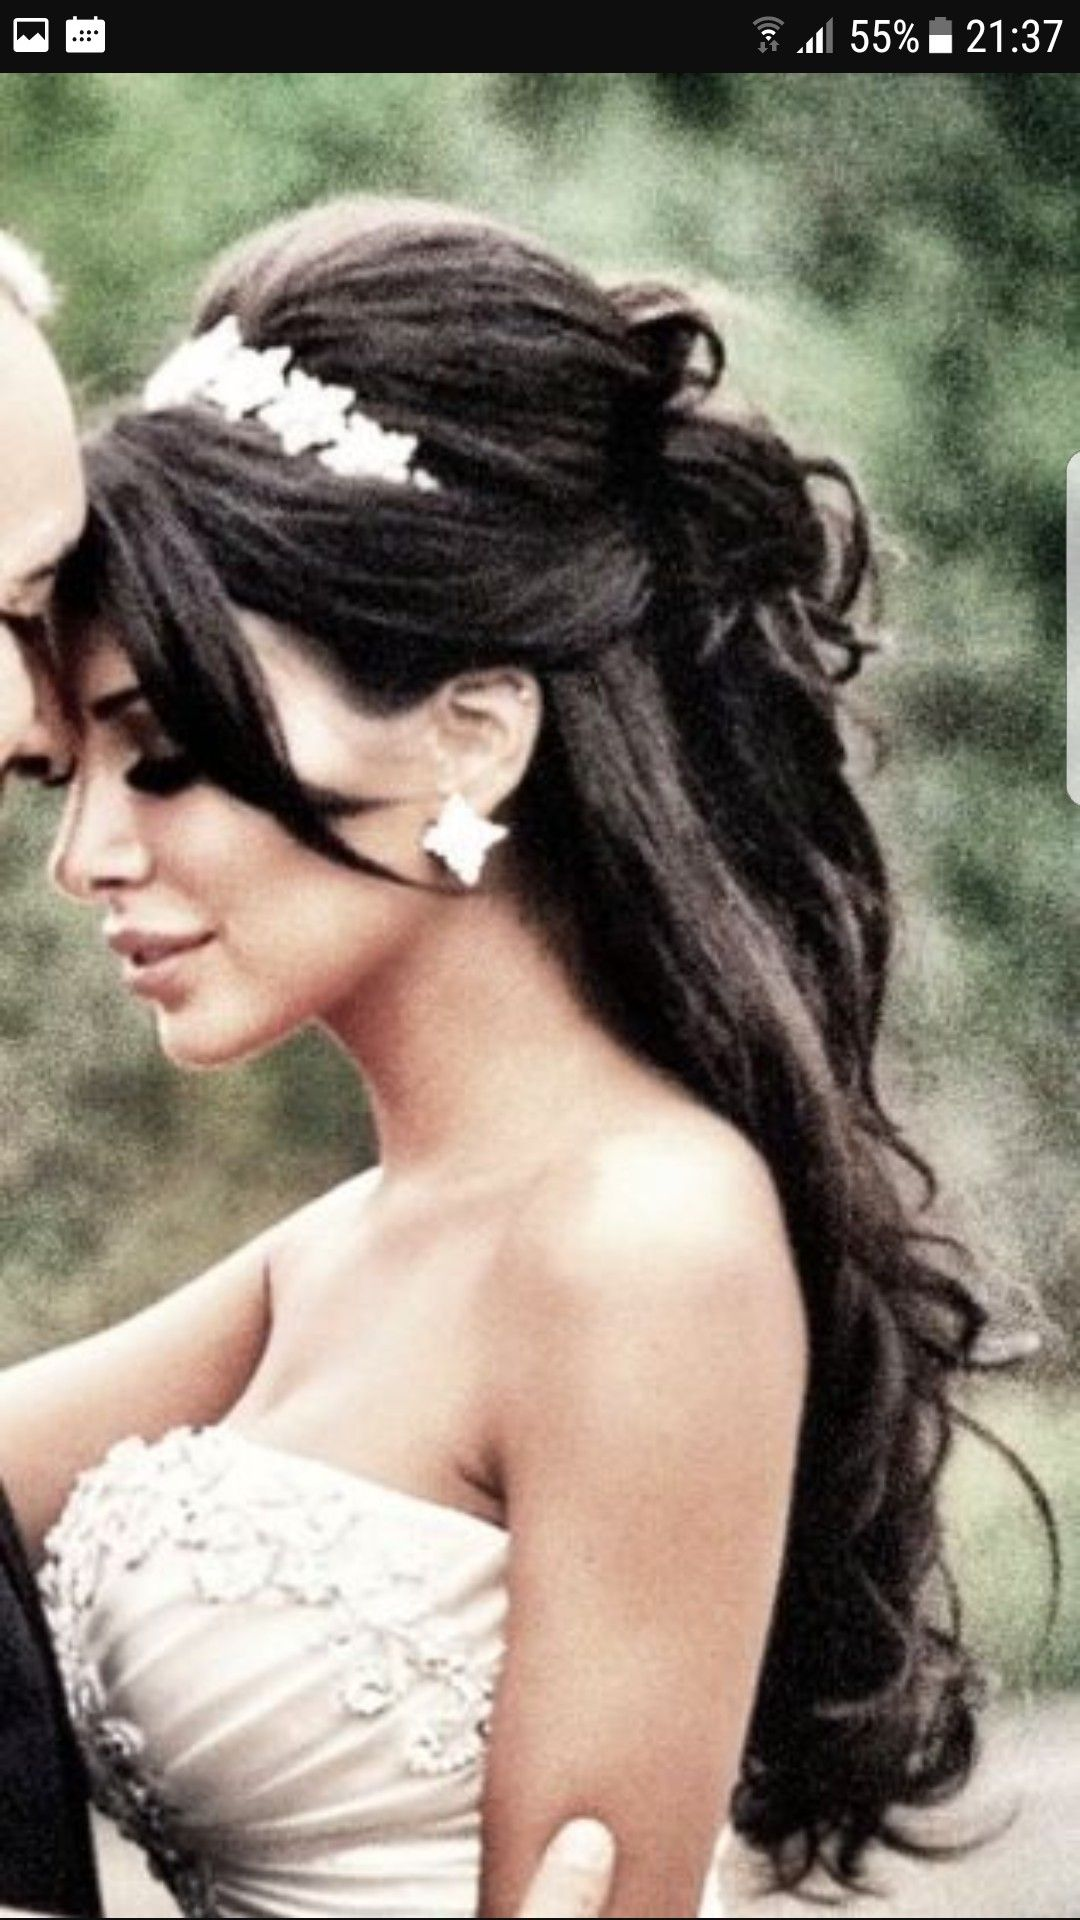 Pin By Amanda Caison On Wedding Pinterest Hair Style